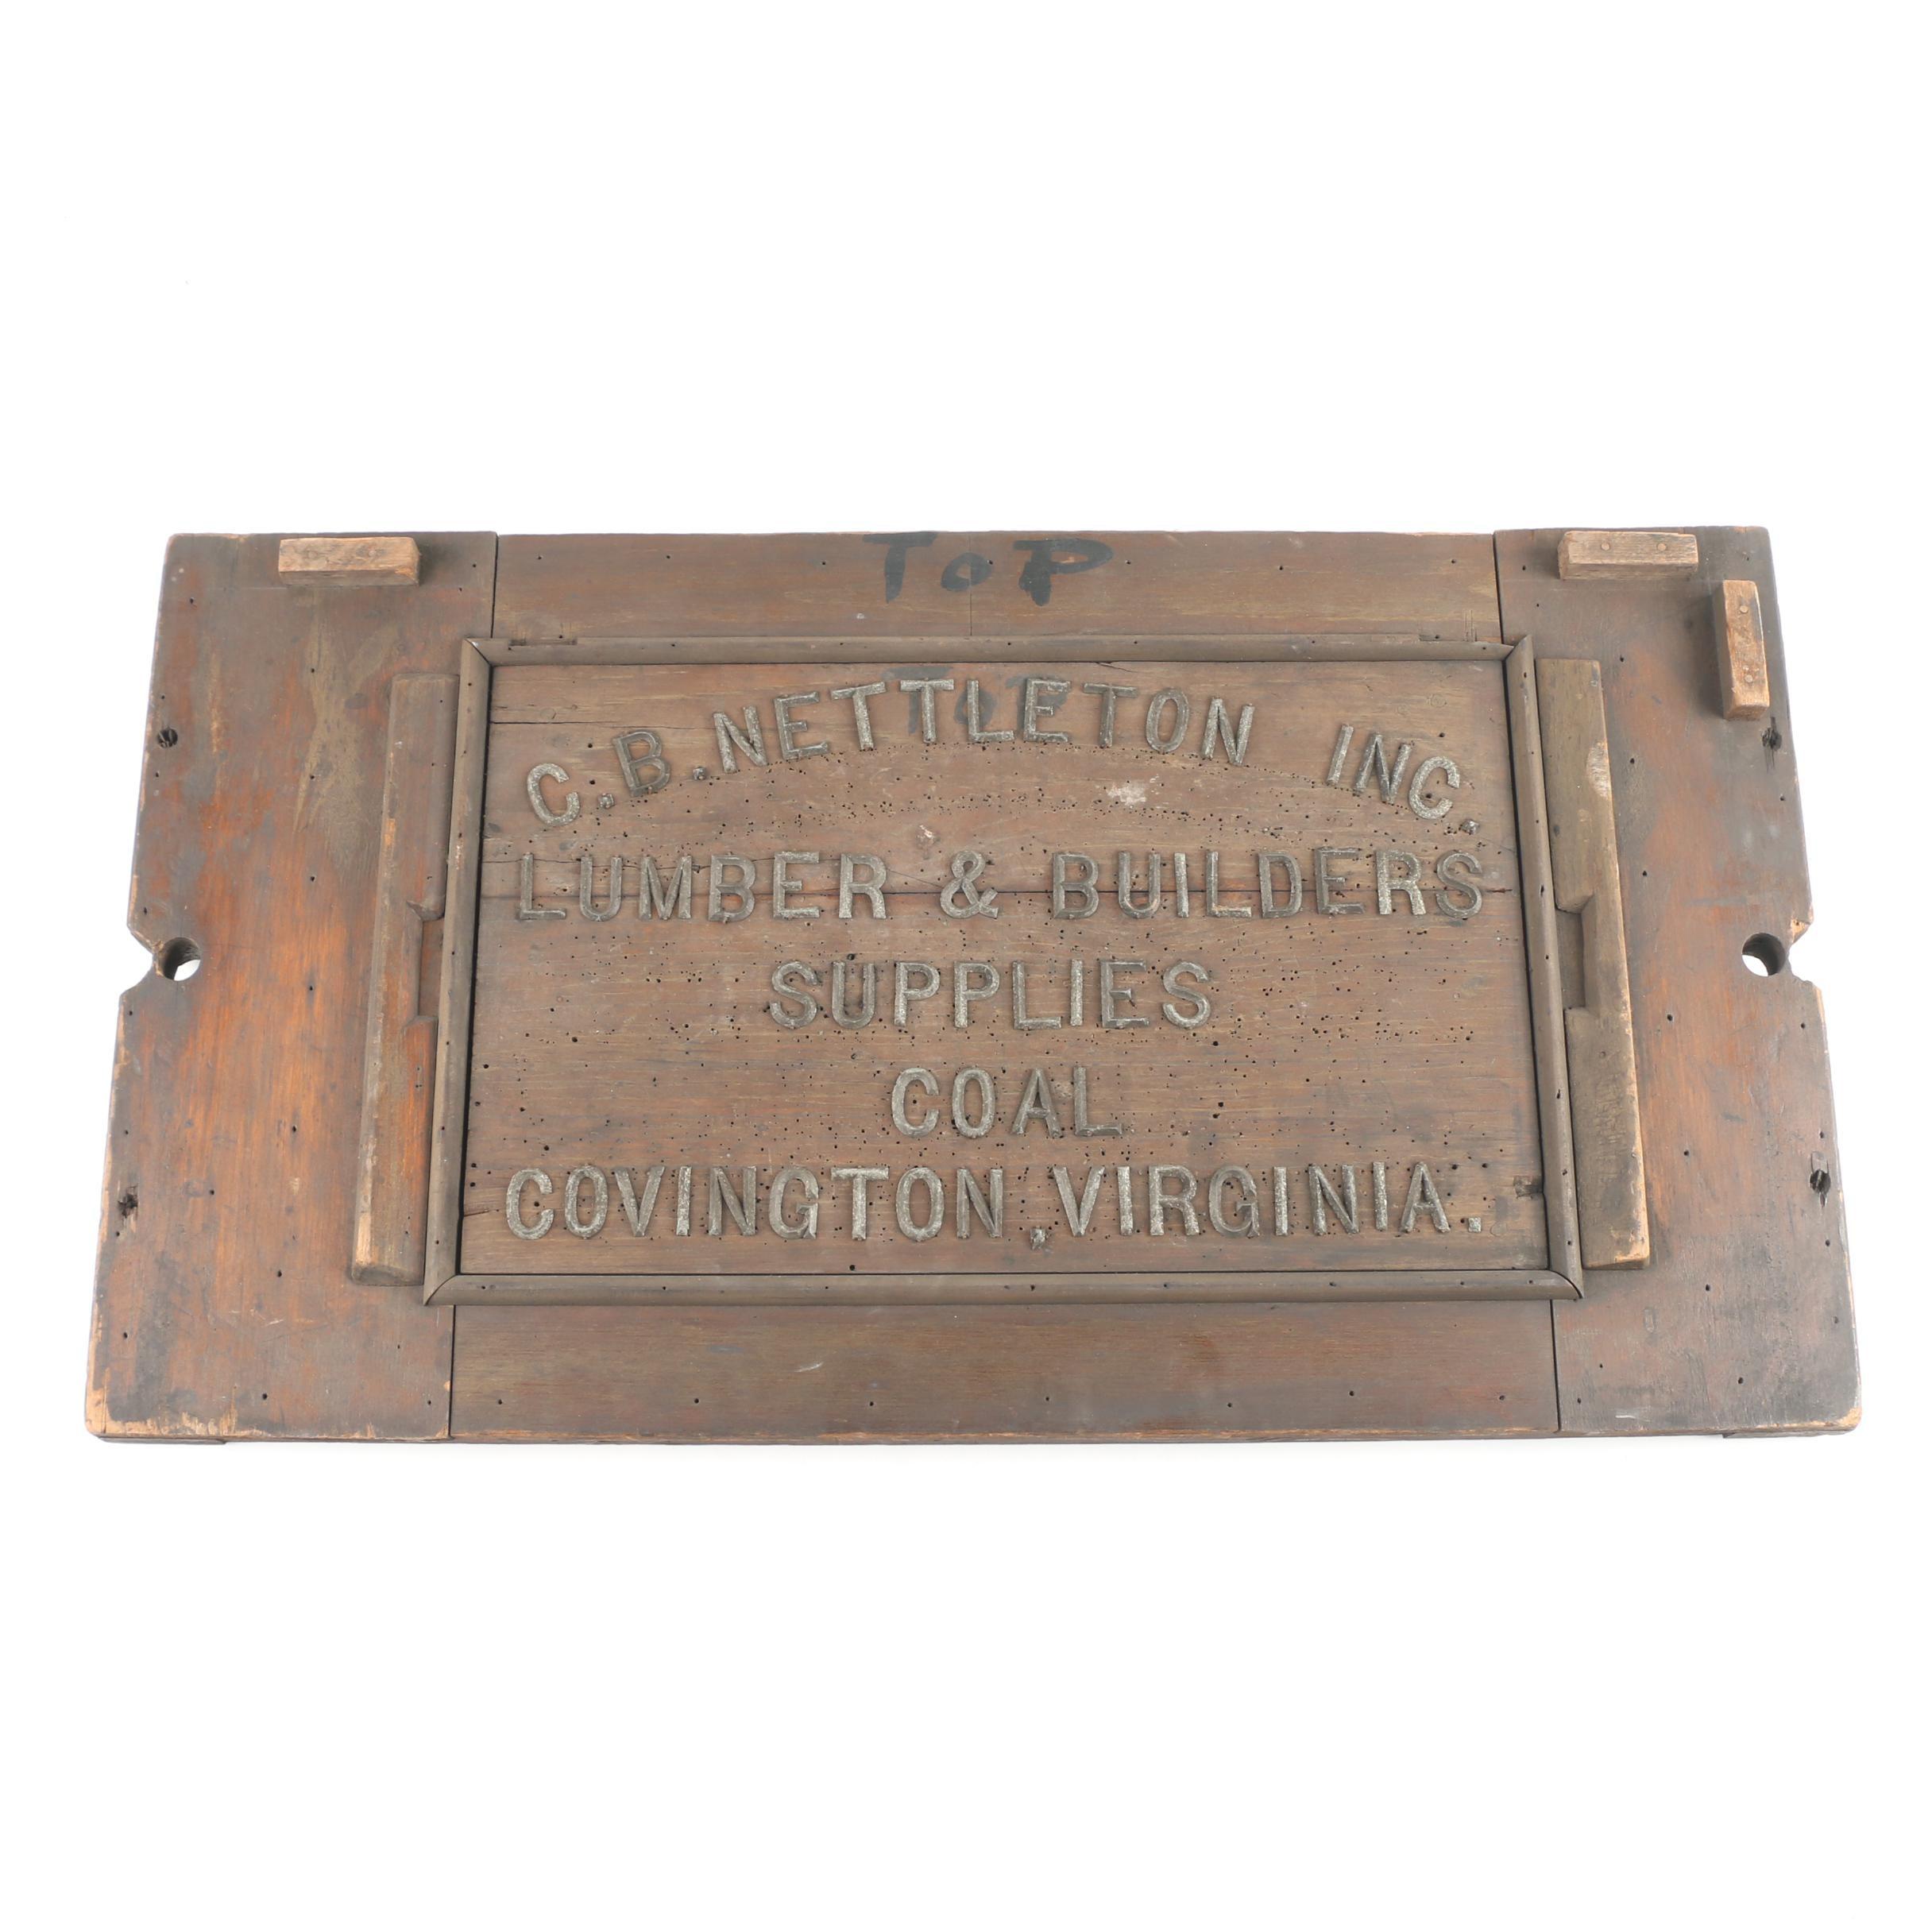 Wood C.B. Nettleton Inc. Lumber and Builder Supplies Advertising Sign, 1930s